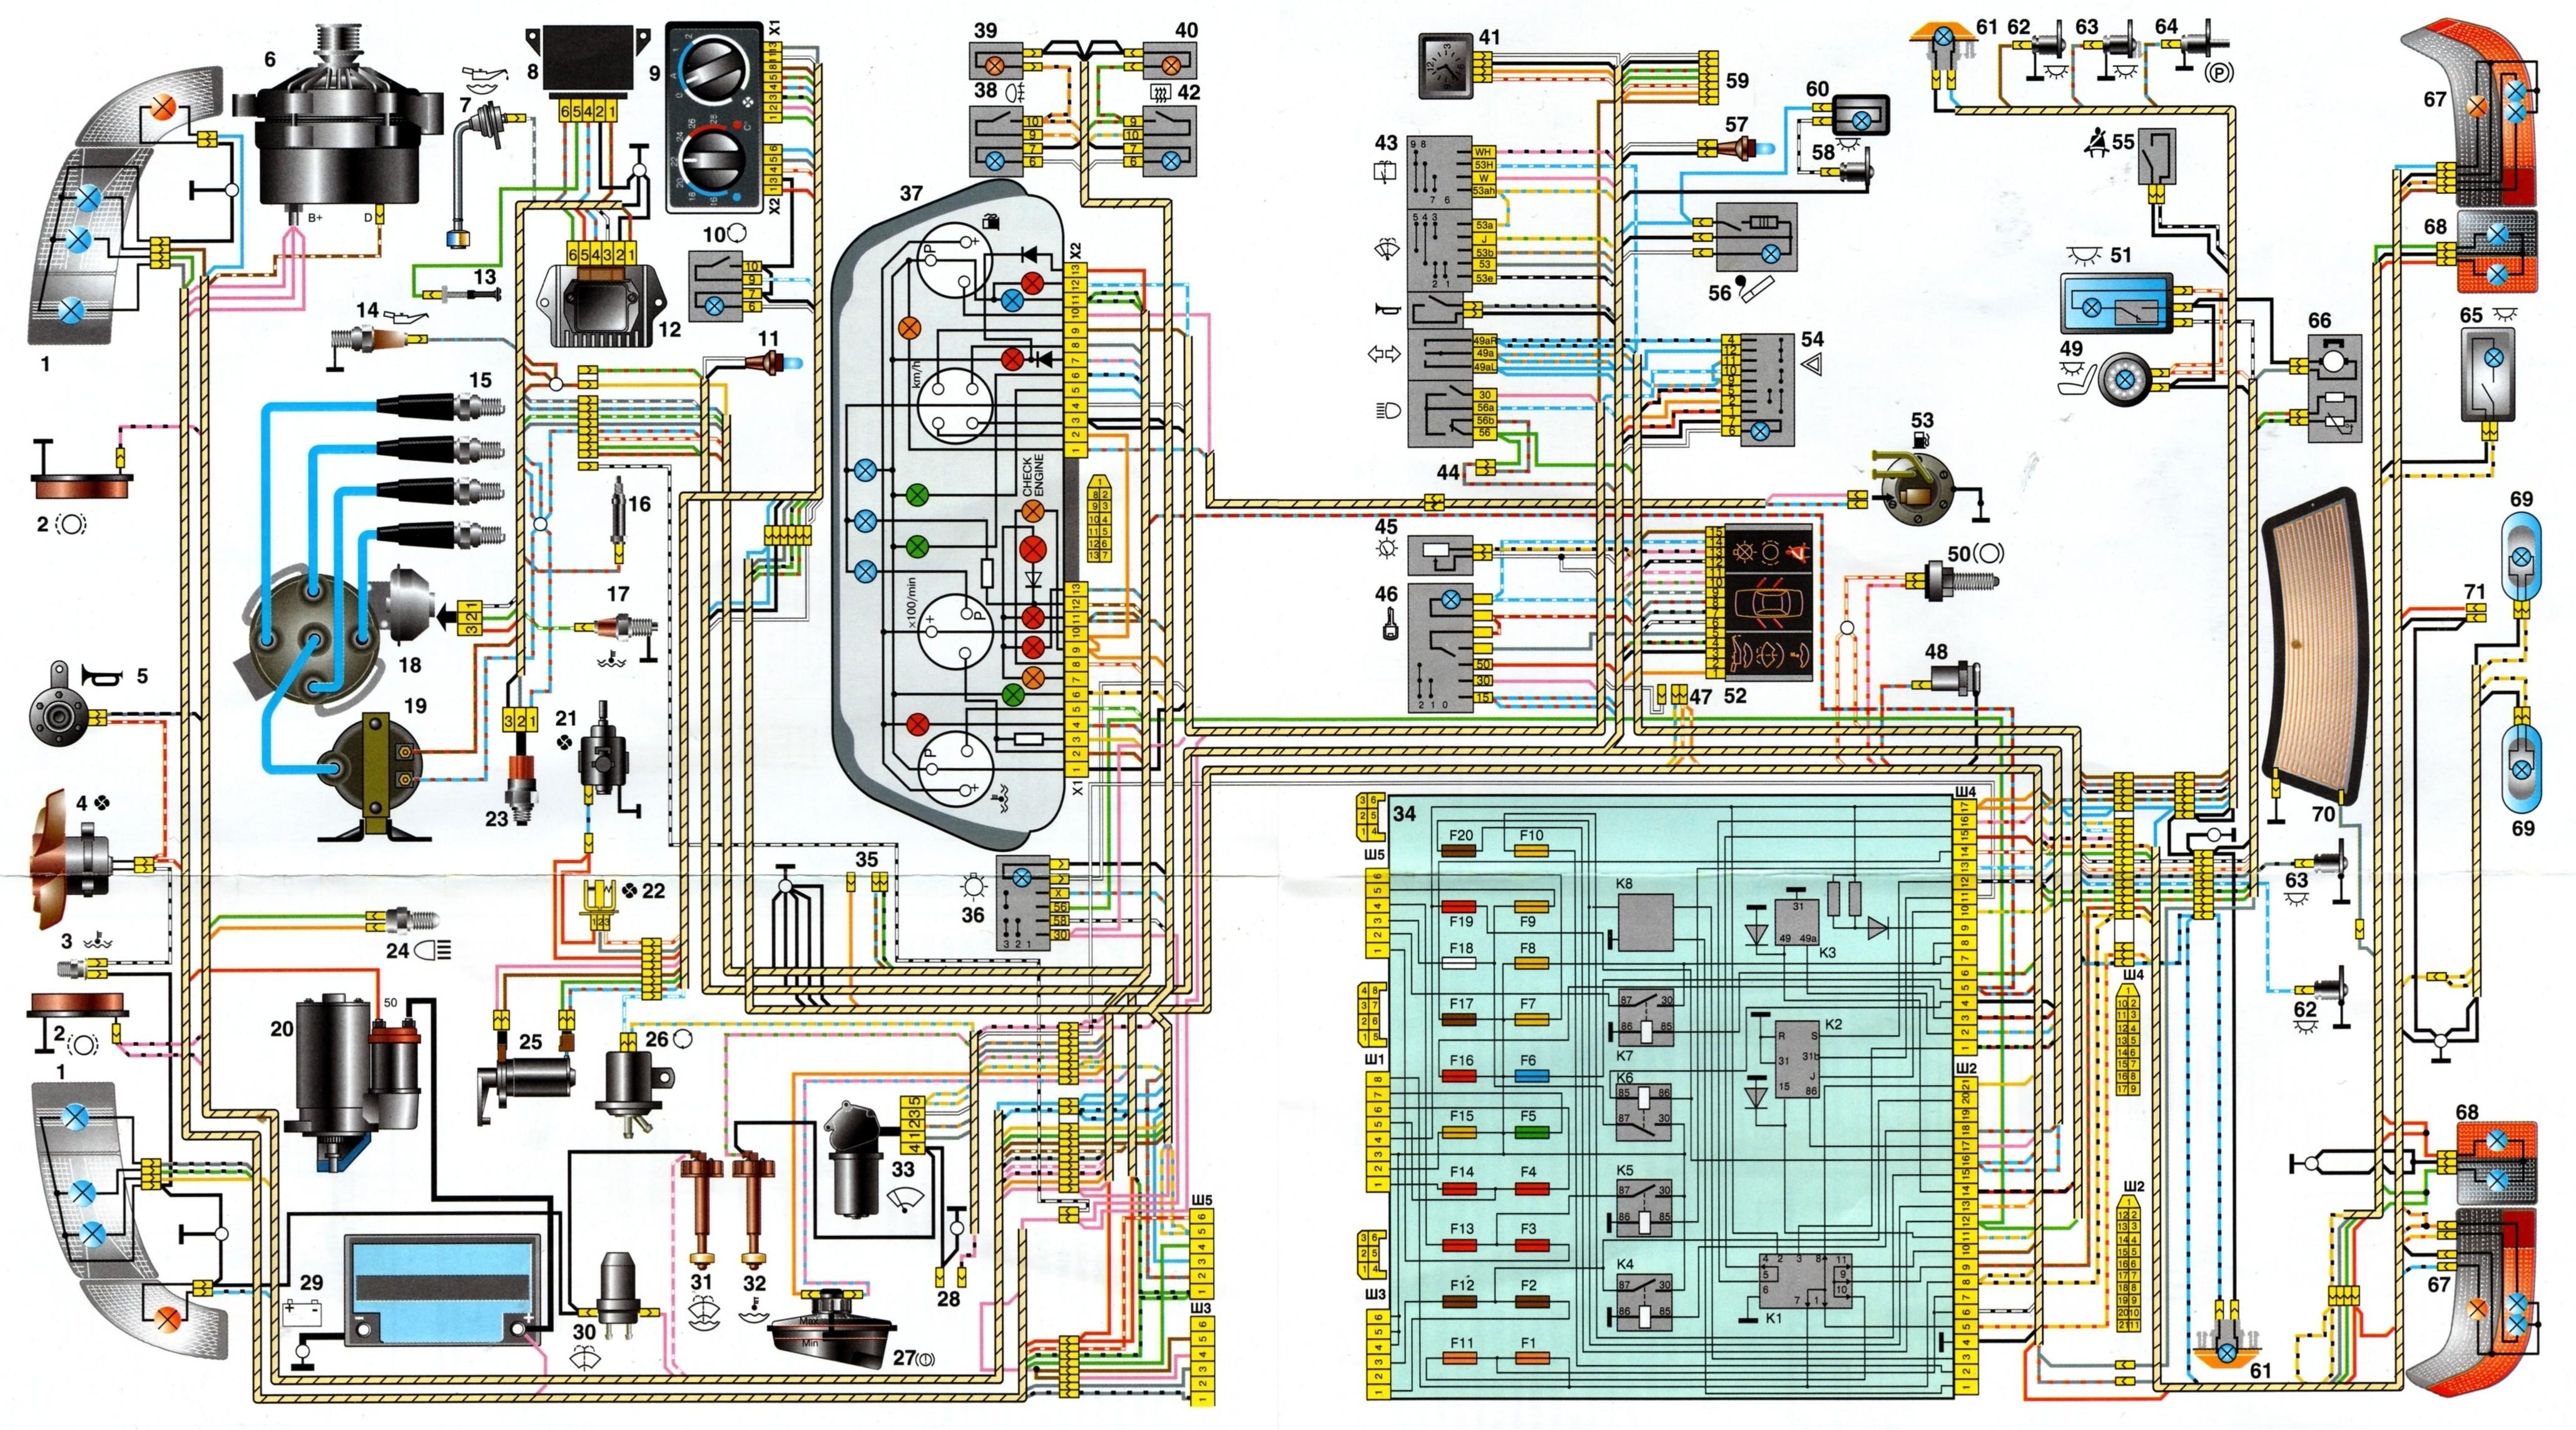 Фото №10 - схема датчика заднего хода ВАЗ 2110